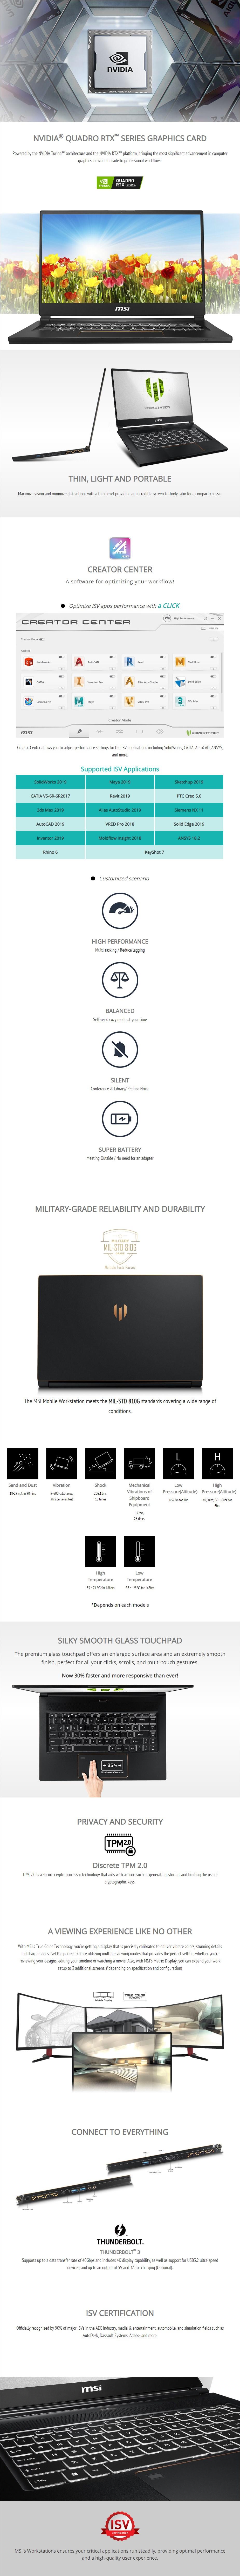 "MSI WS65 15.6"" Mobile Workstation i7-9750H 32GB 1TB Quadro RTX 3000 W10P - Overview 1"